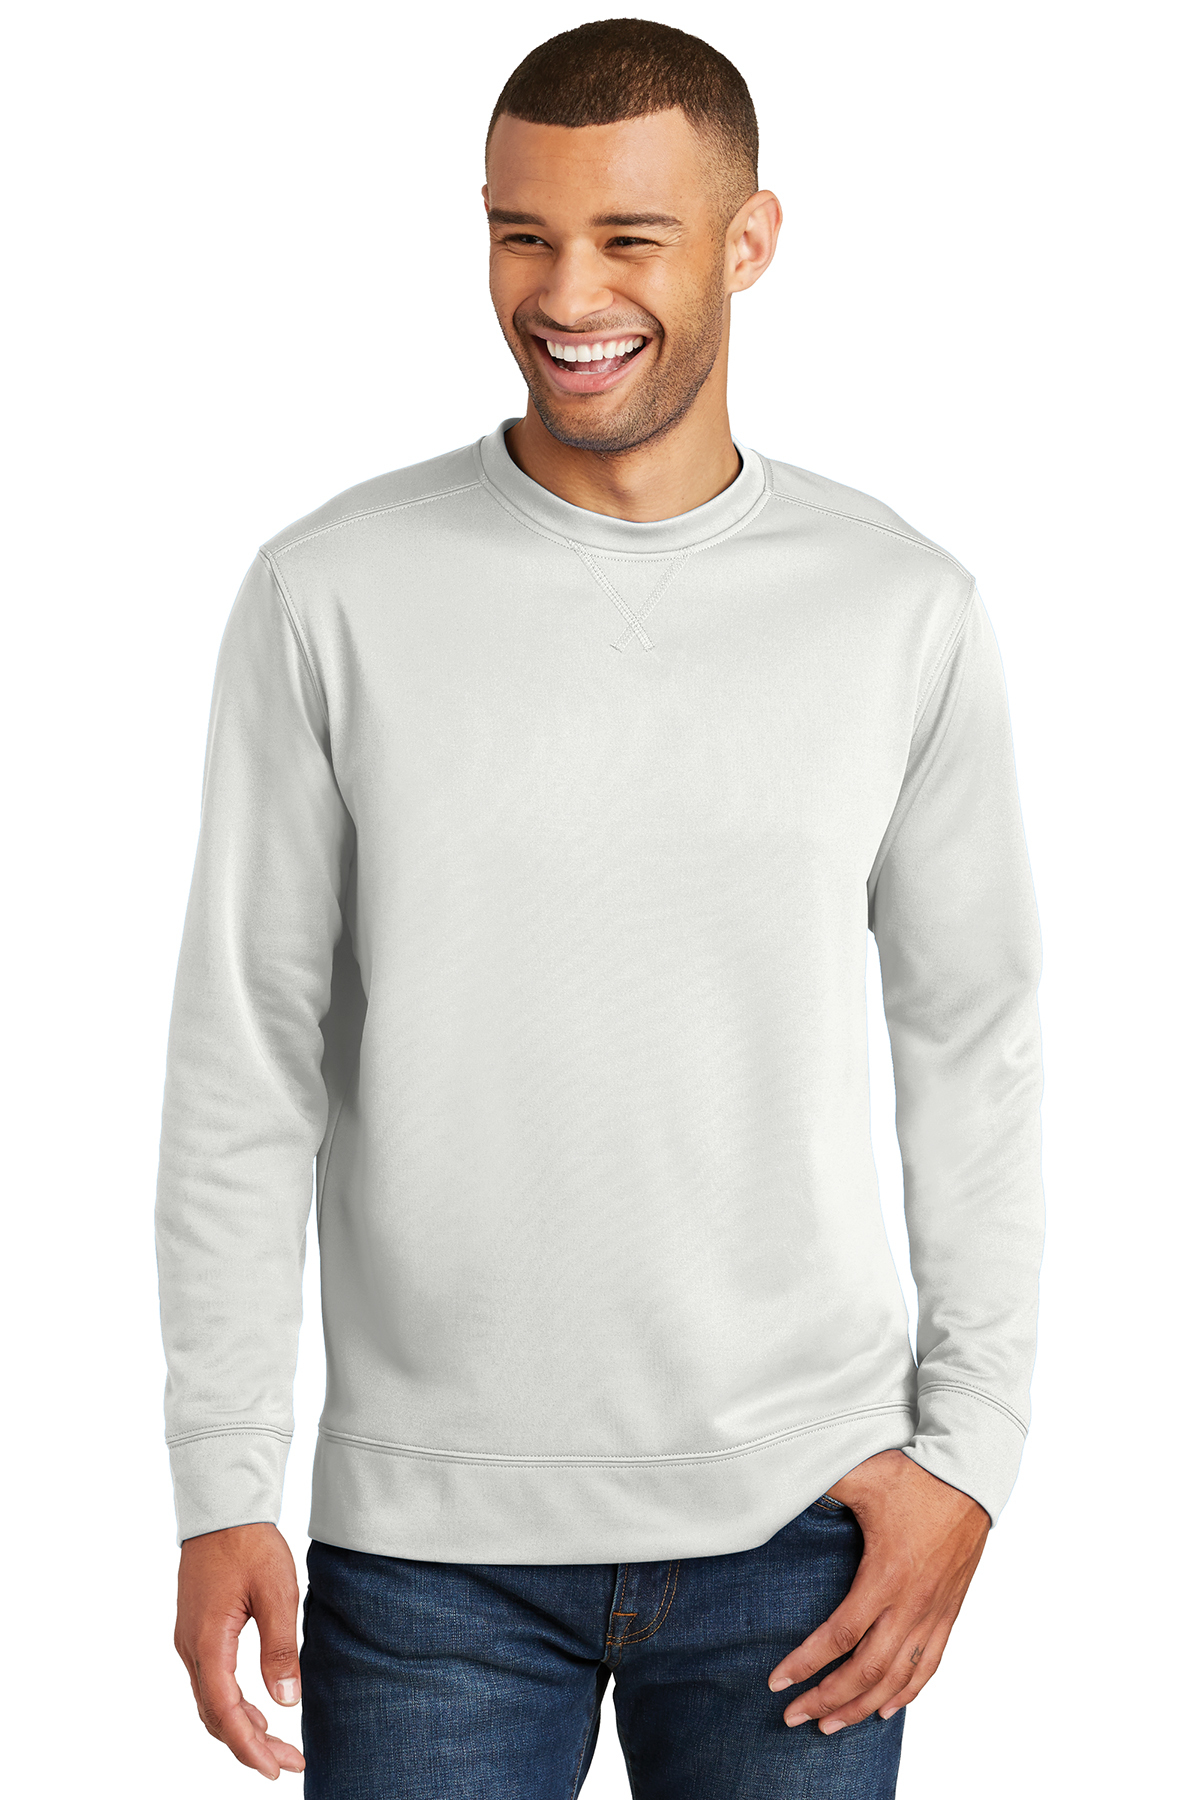 Port & Company PC590 - Performance Fleece Crewneck Sweatshirt